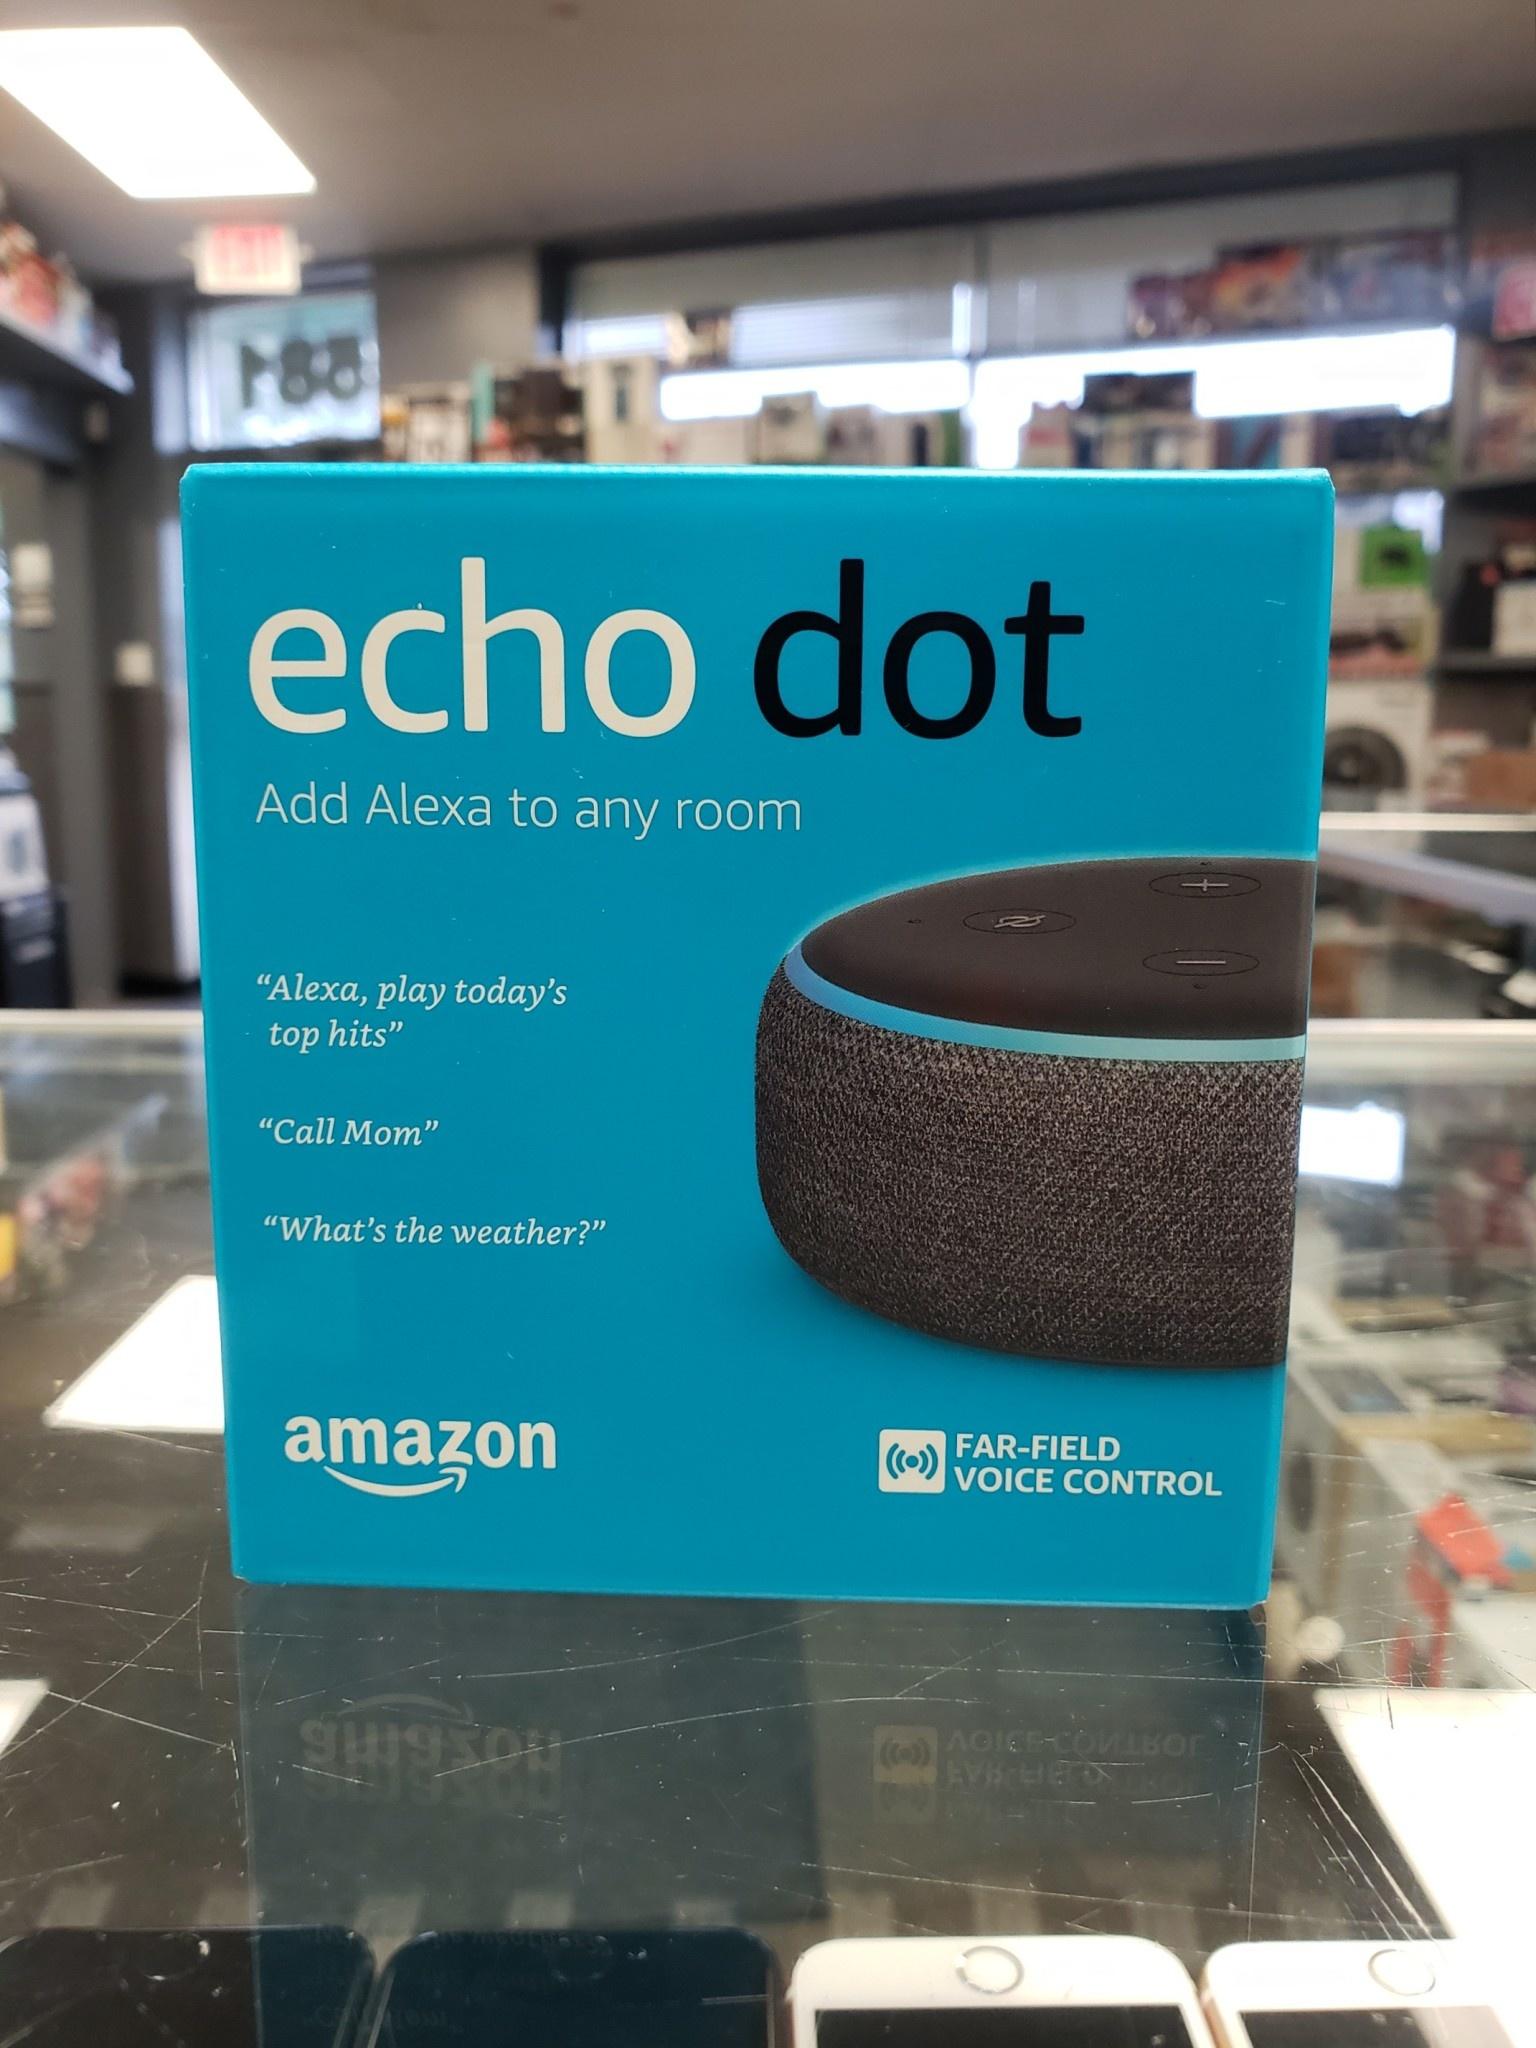 New - Amazon Echo Dot 3 - Alexa Personal Assistant (Black)